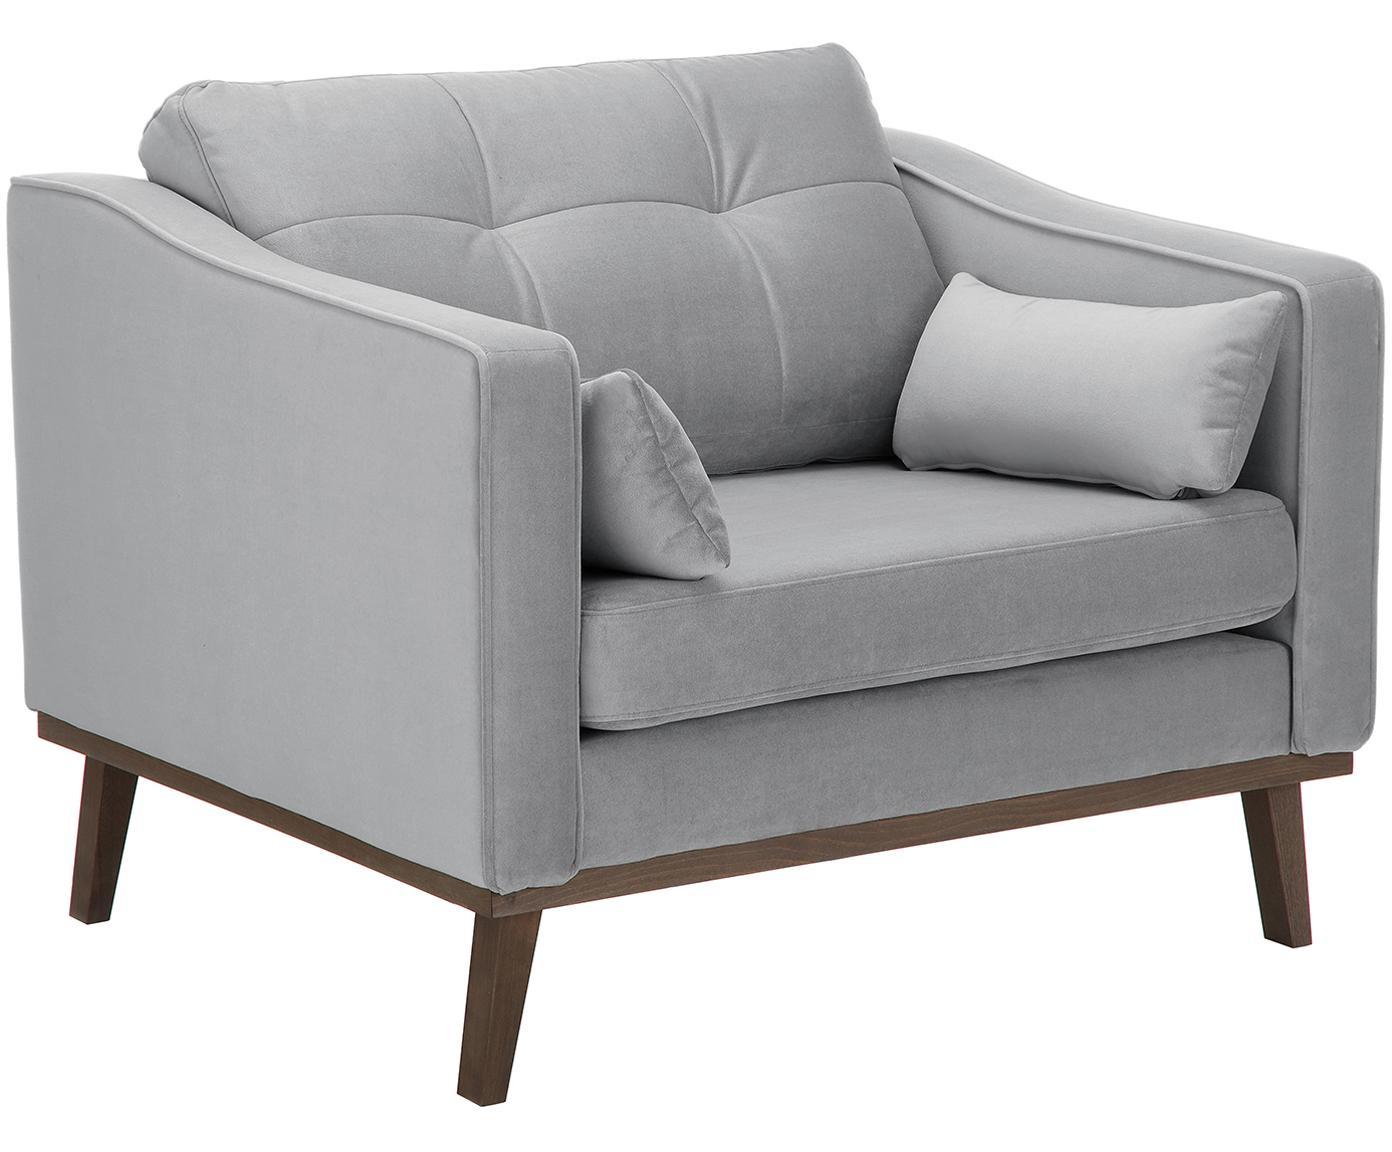 Klassischer Samt-Sessel Alva in Grau, Bezug: Samt (Hochwertiger Polyes, Gestell: Massives Kiefernholz, Samt Grau, B 102 x T 92 cm